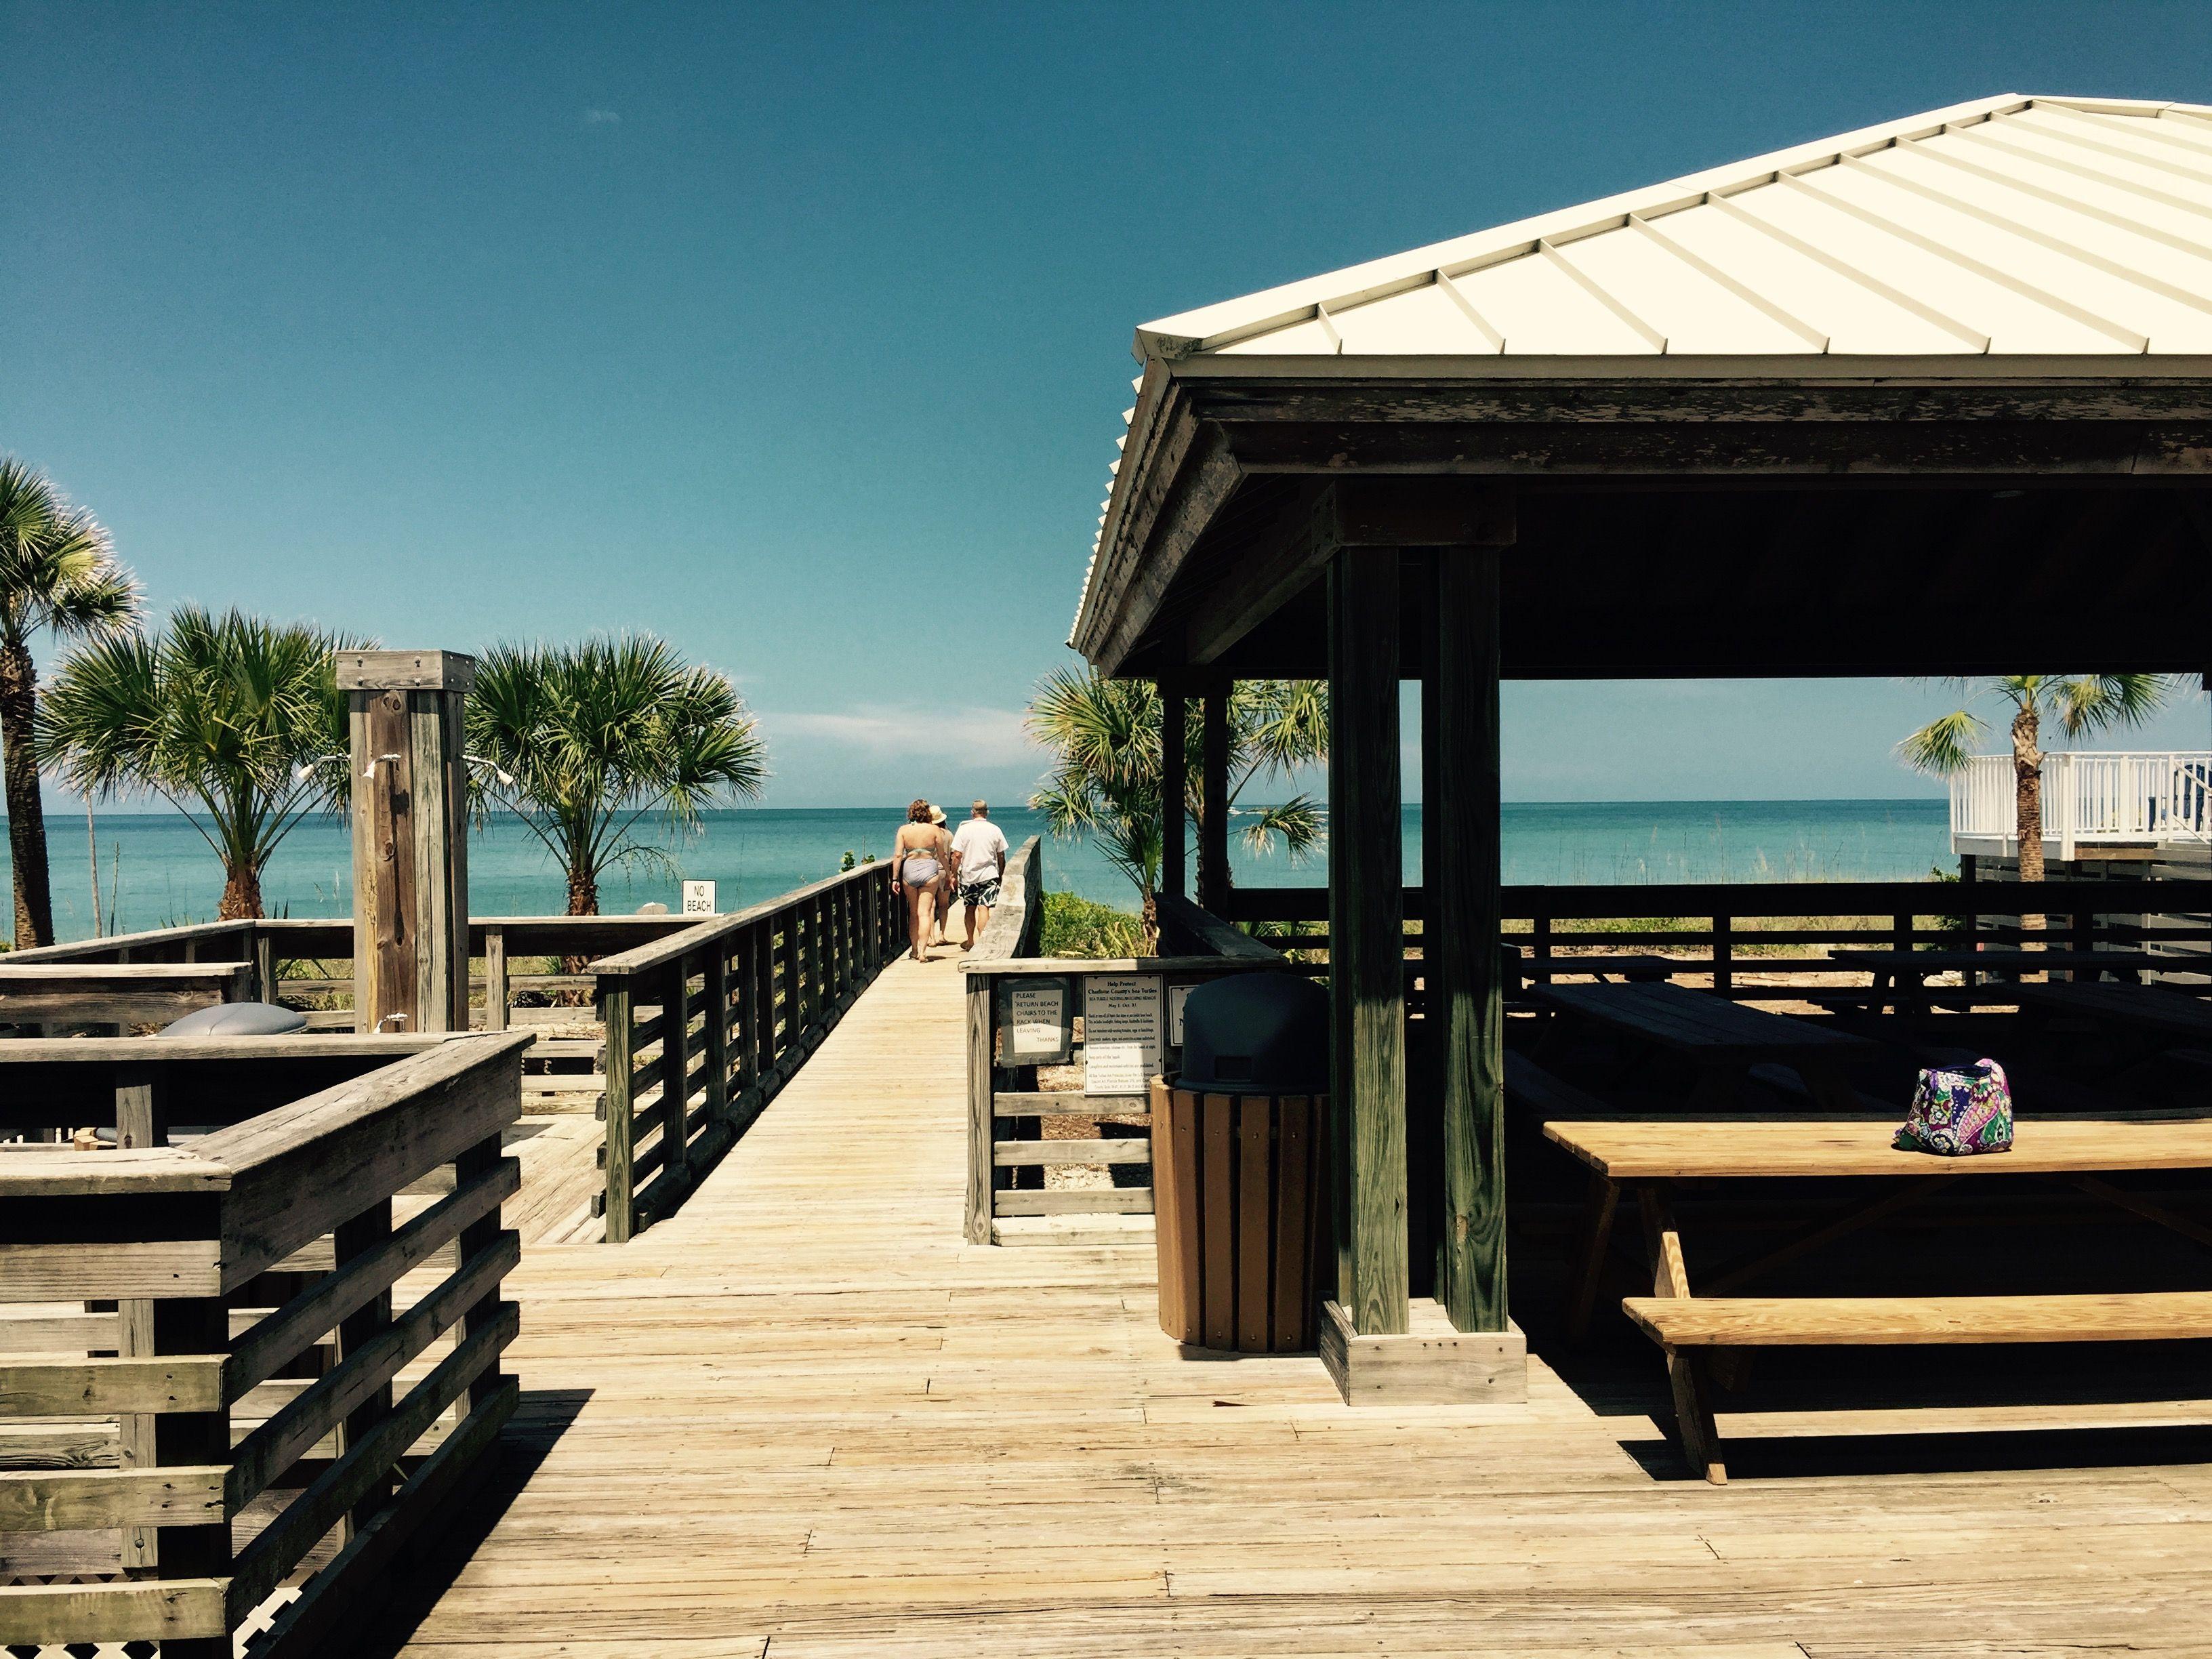 The boardwalk to the Riverwood Beach Club on Englewood ...